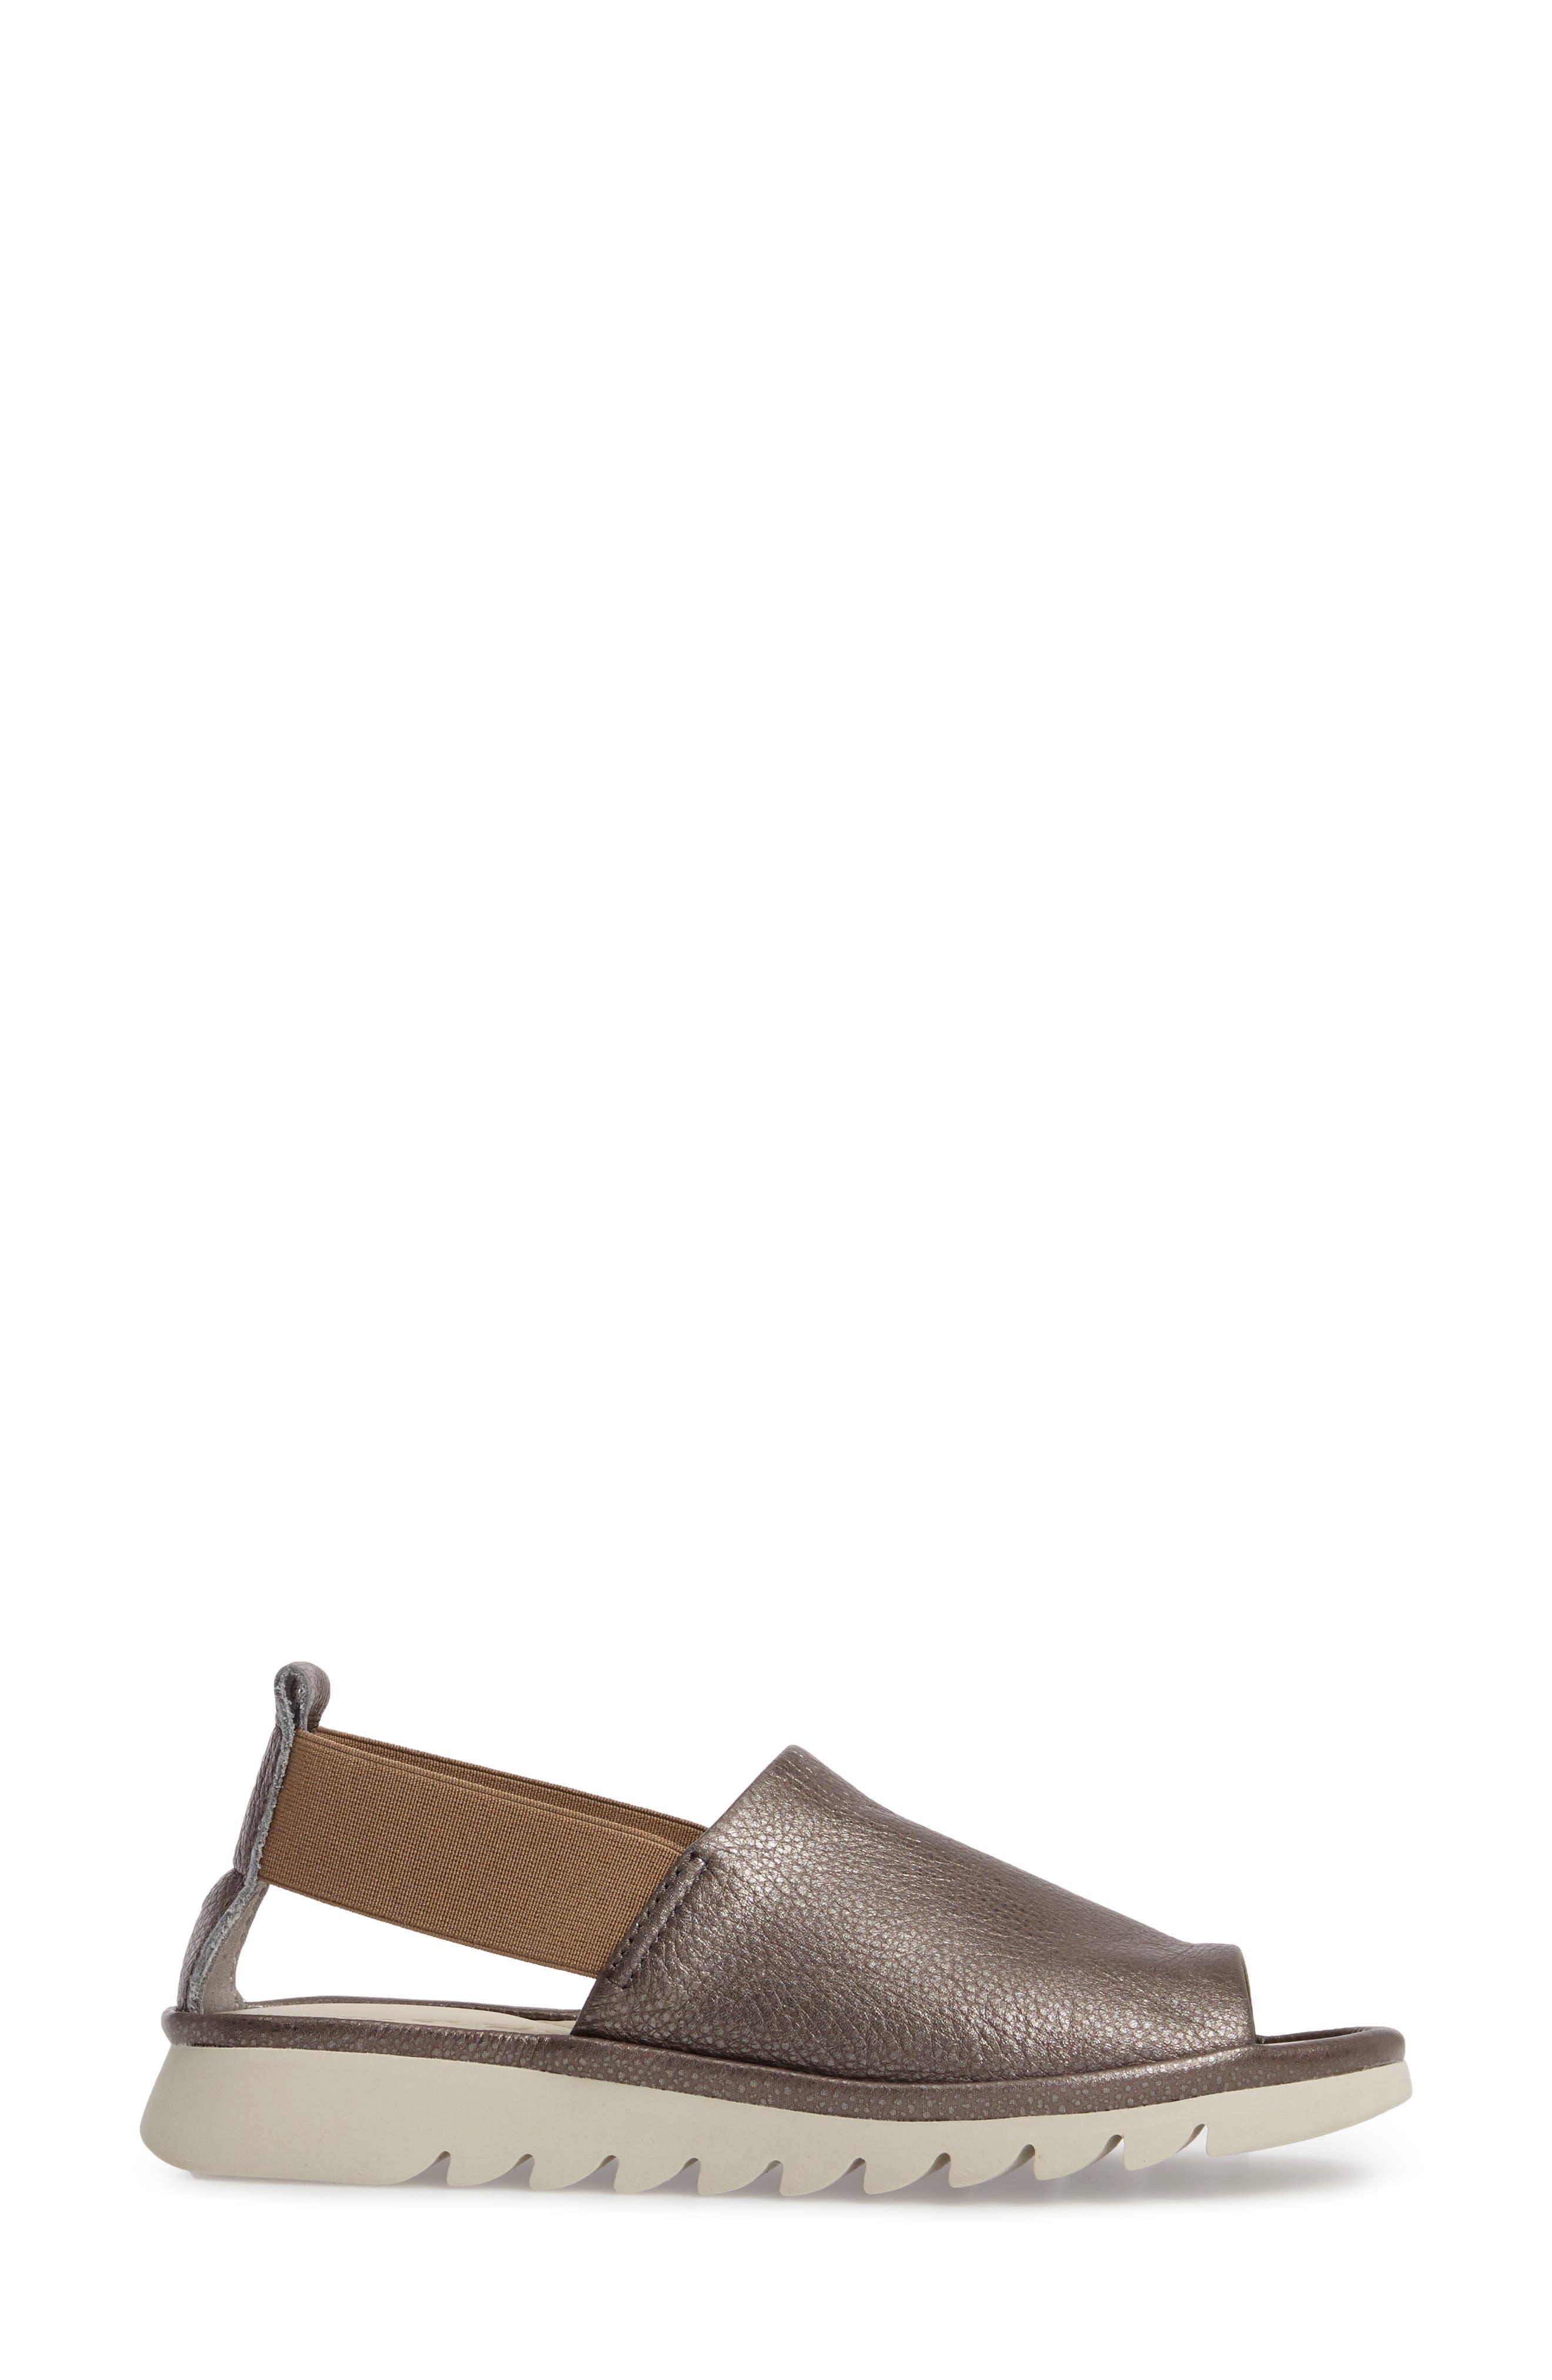 Shore Line Sandal,                             Alternate thumbnail 3, color,                             Canna Di Fucile Leather